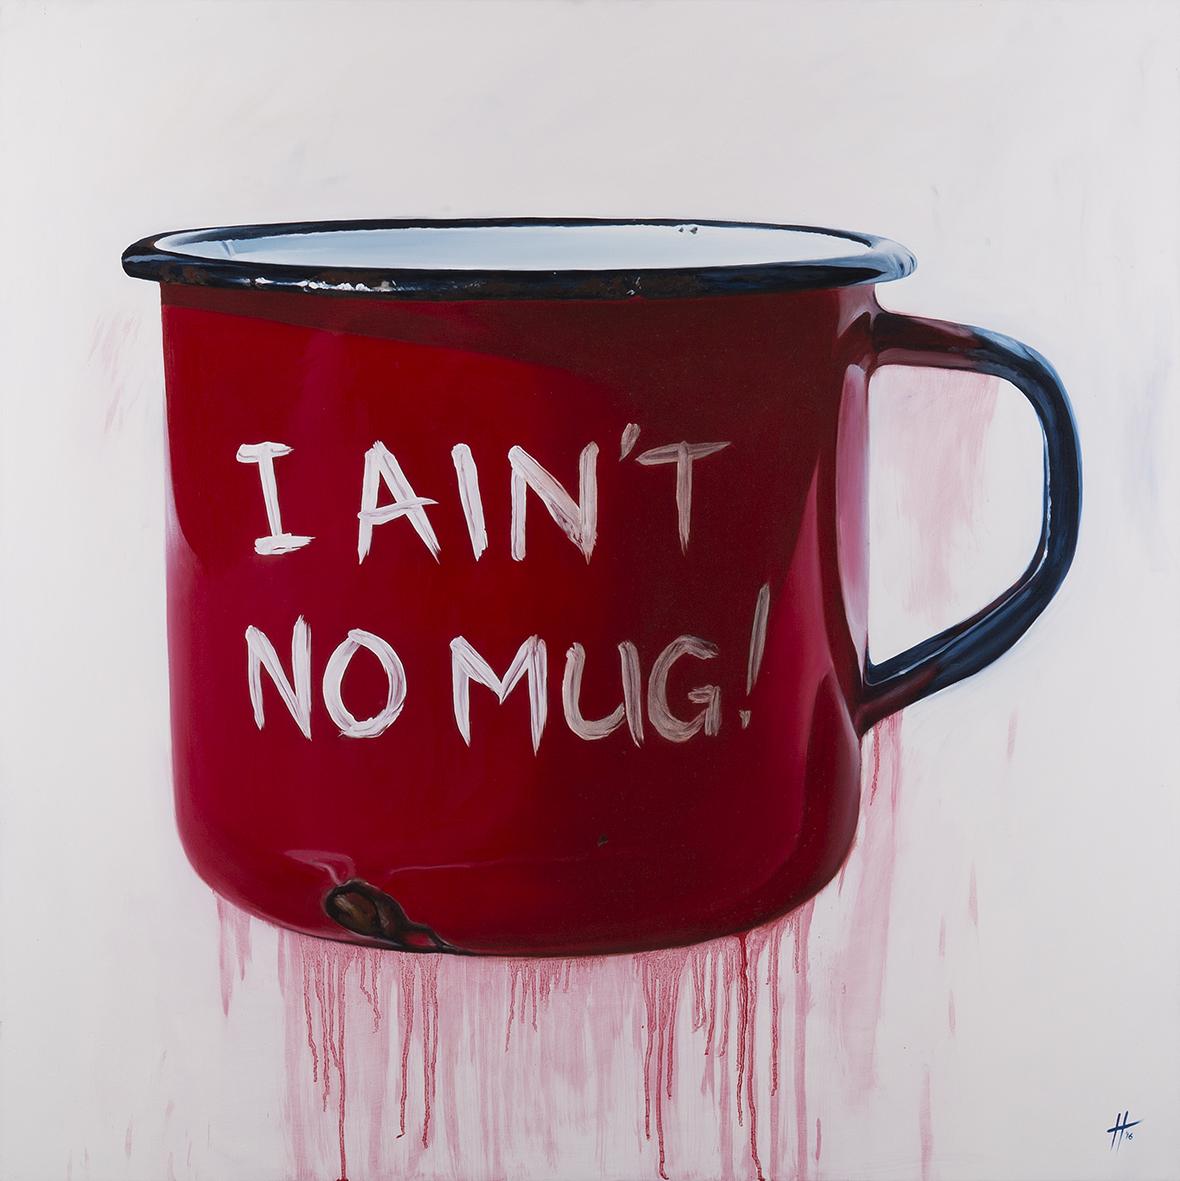 I-AInt-No-Mug.jpg